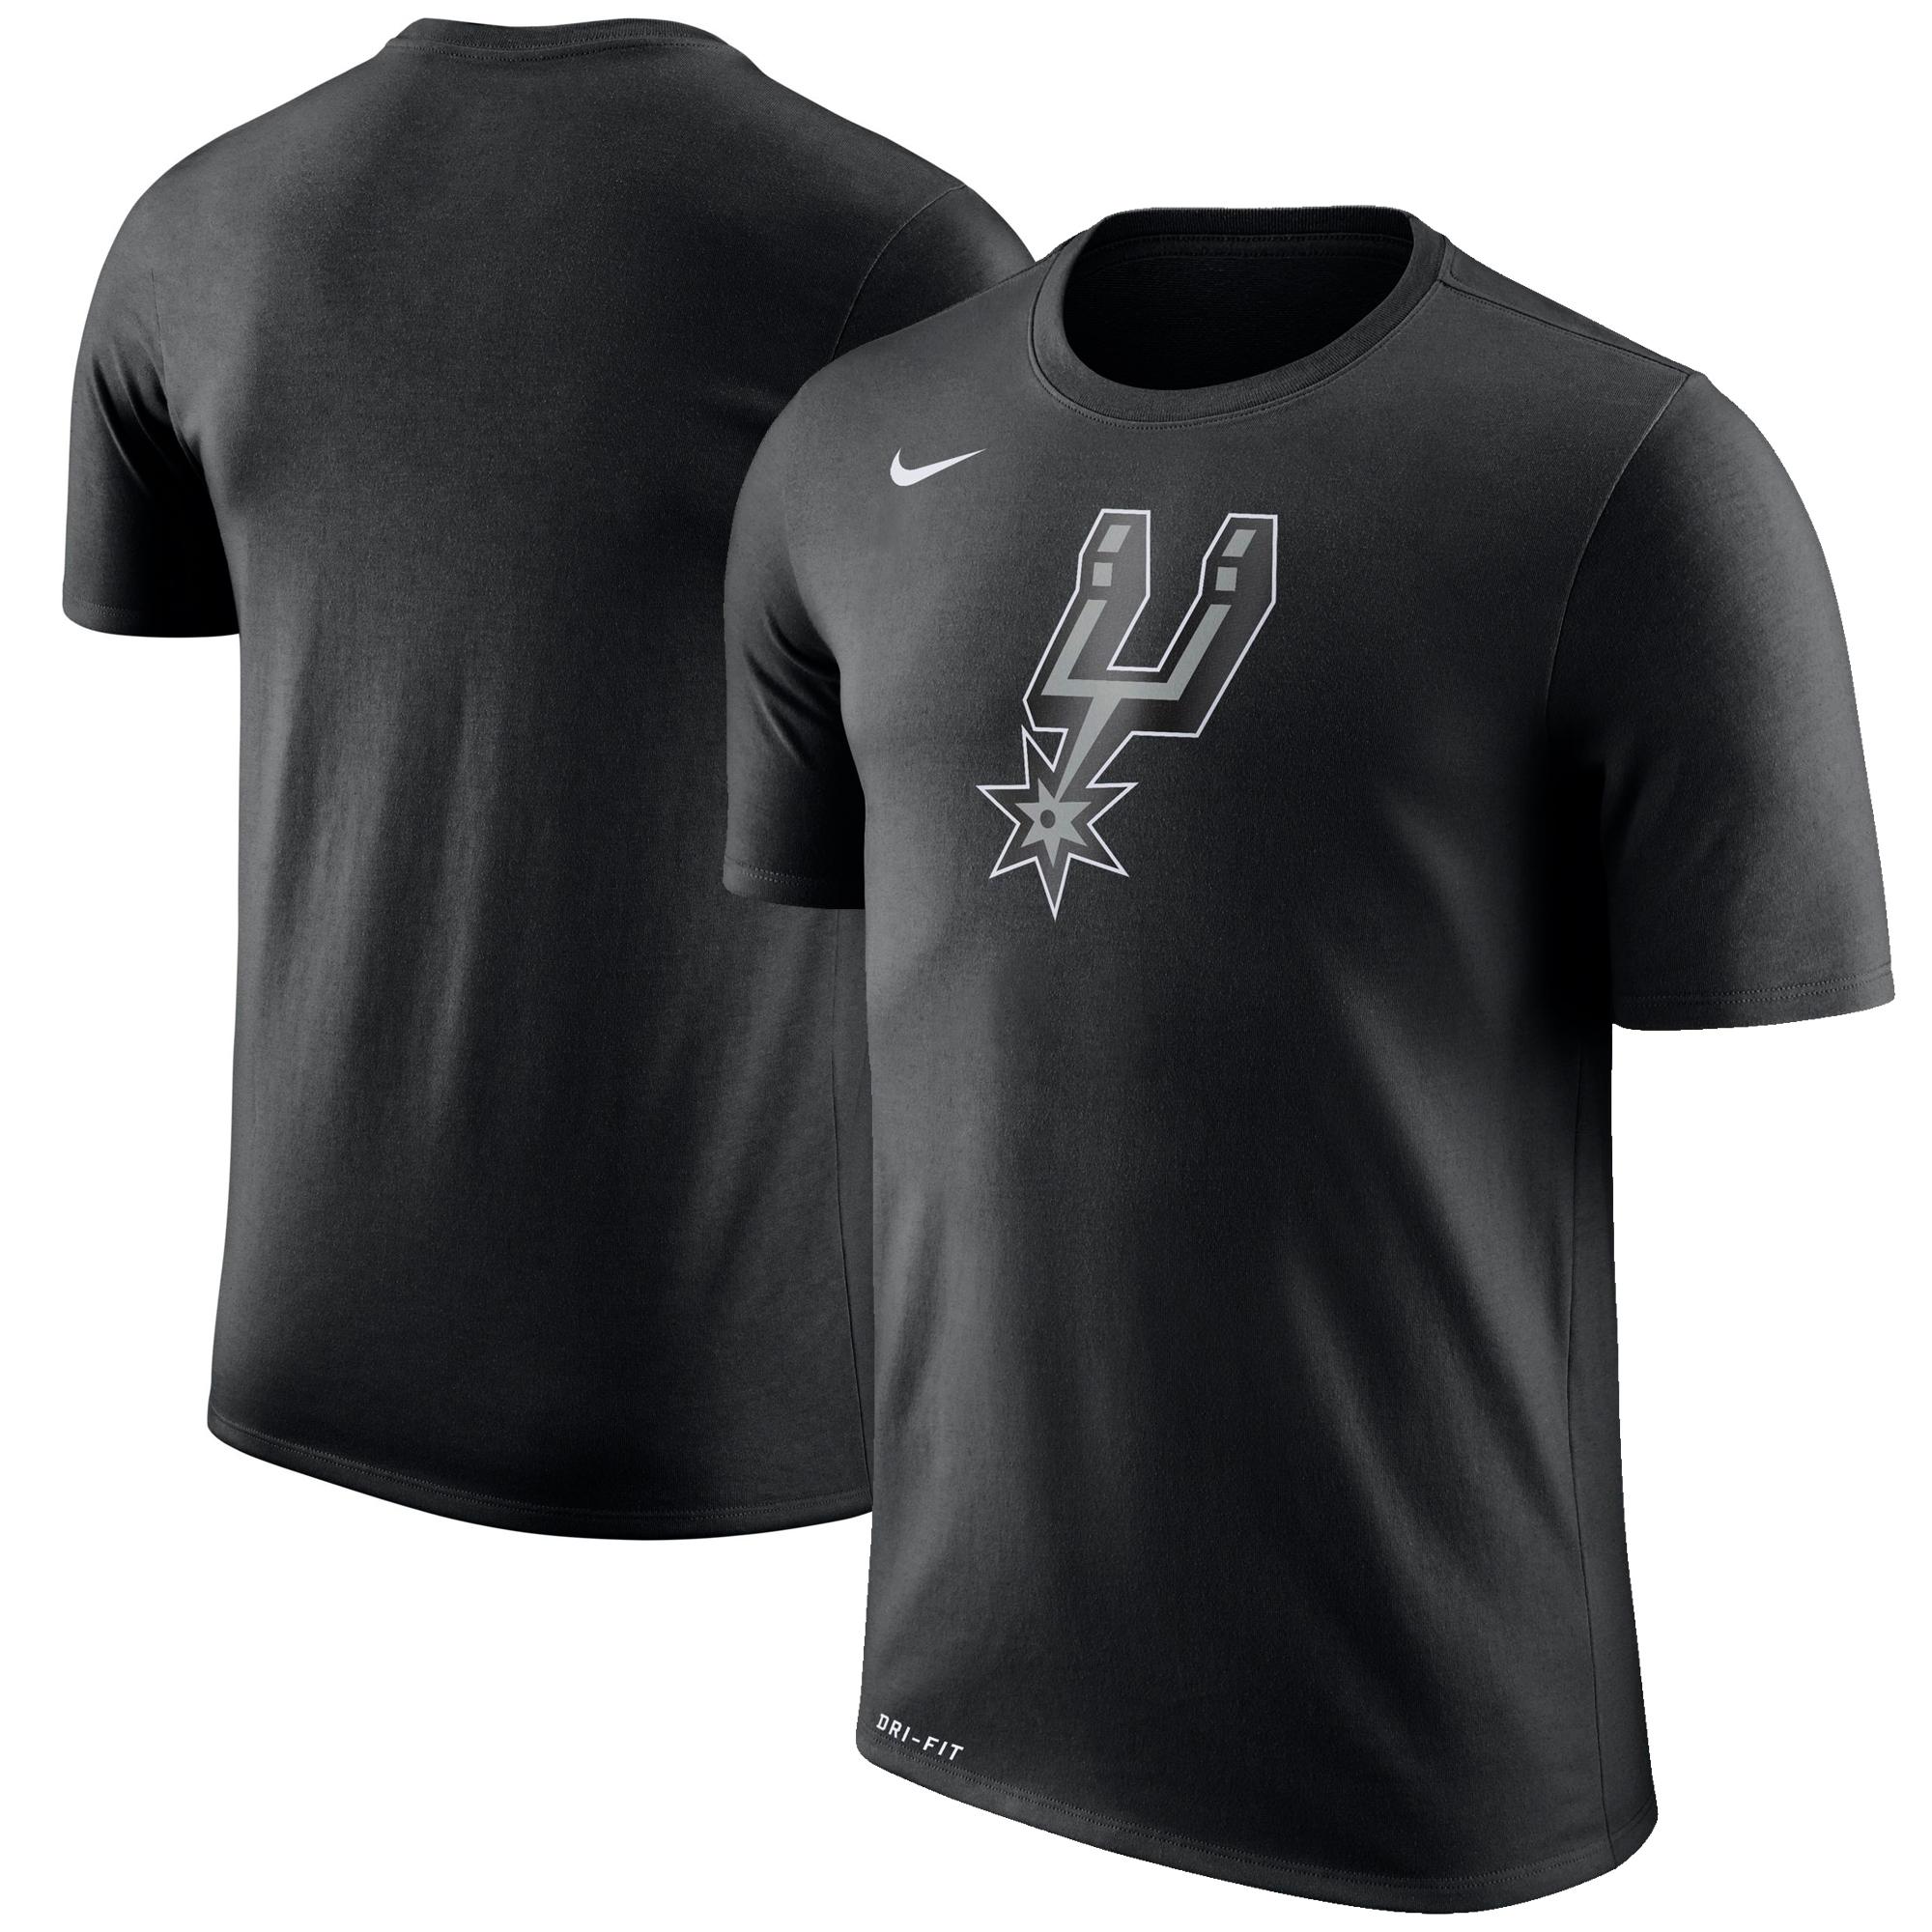 San Antonio Spurs Nike Logo T-Shirt - Black - S